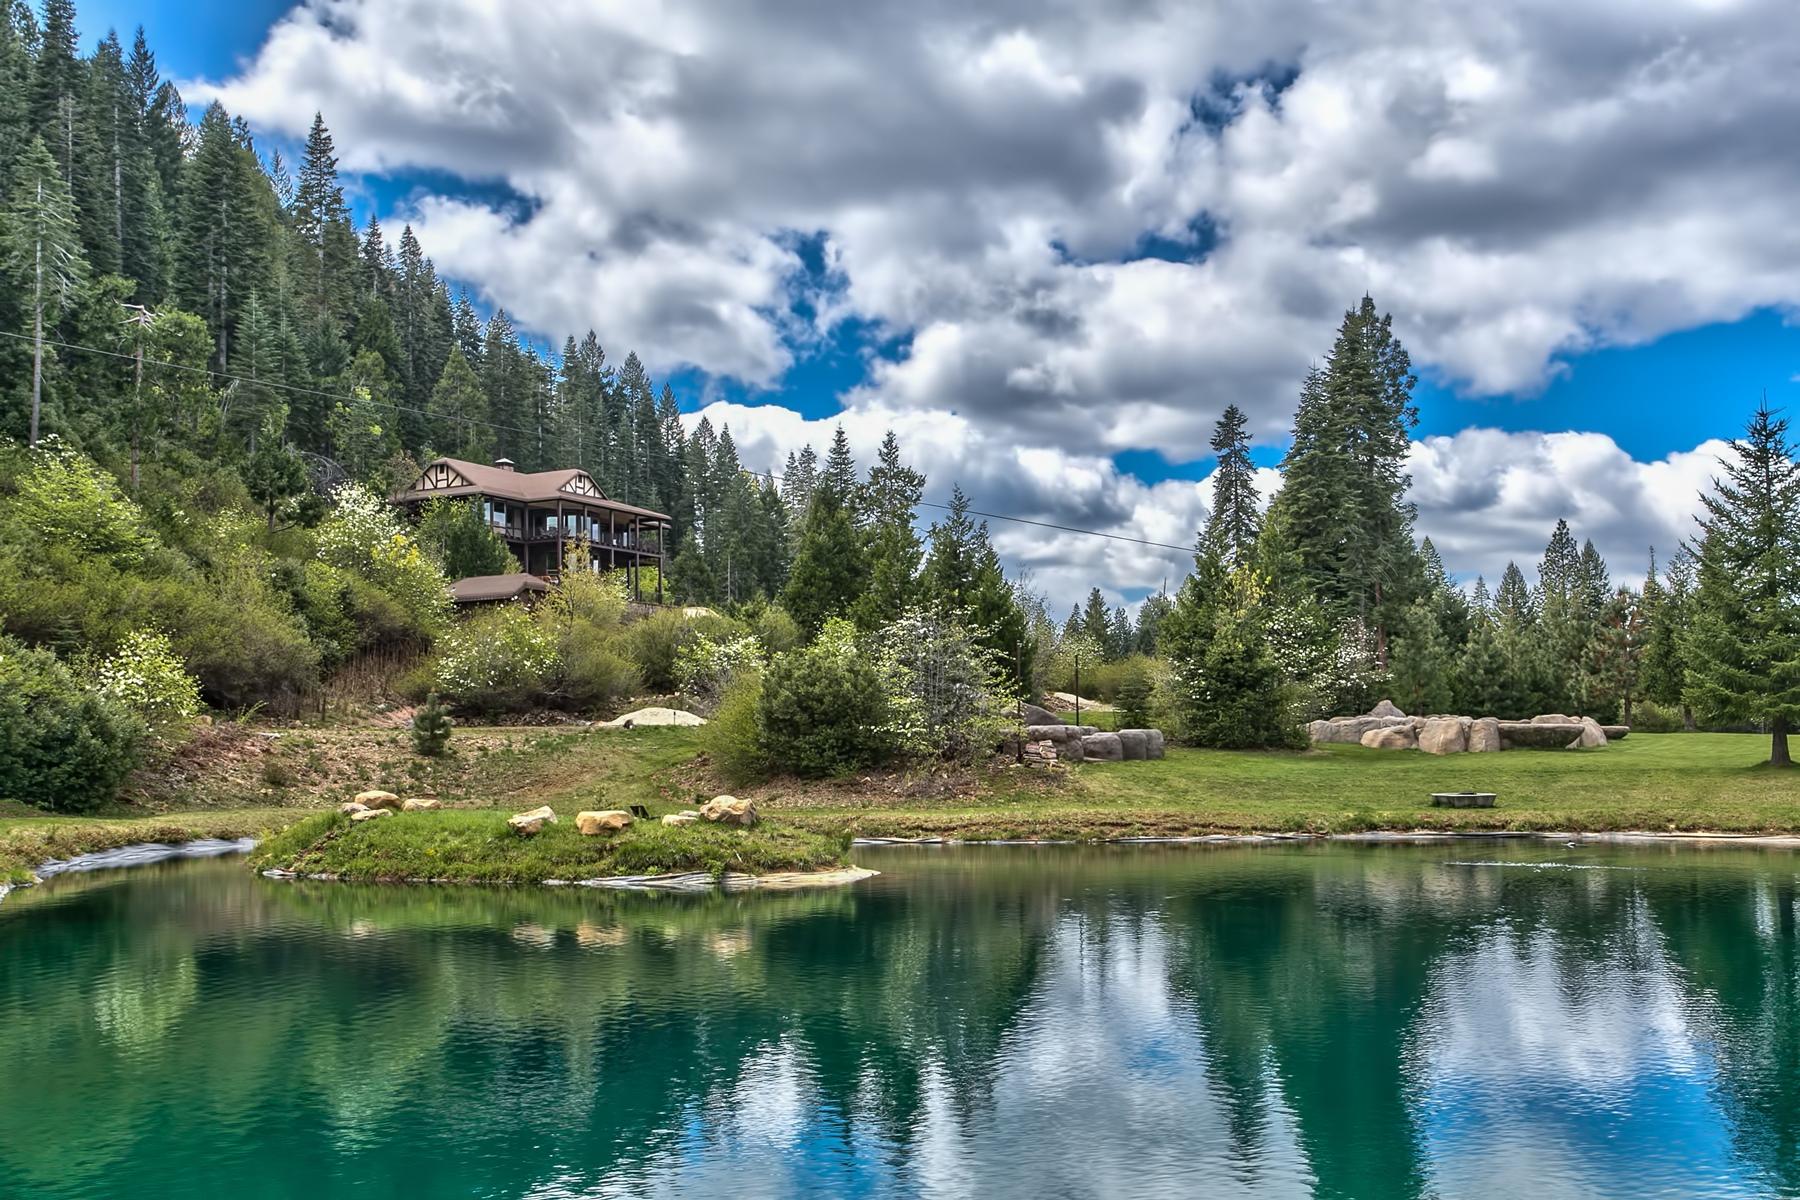 Single Family Home for Active at 28175 Myhrer Way Nevada City, California 95959 United States